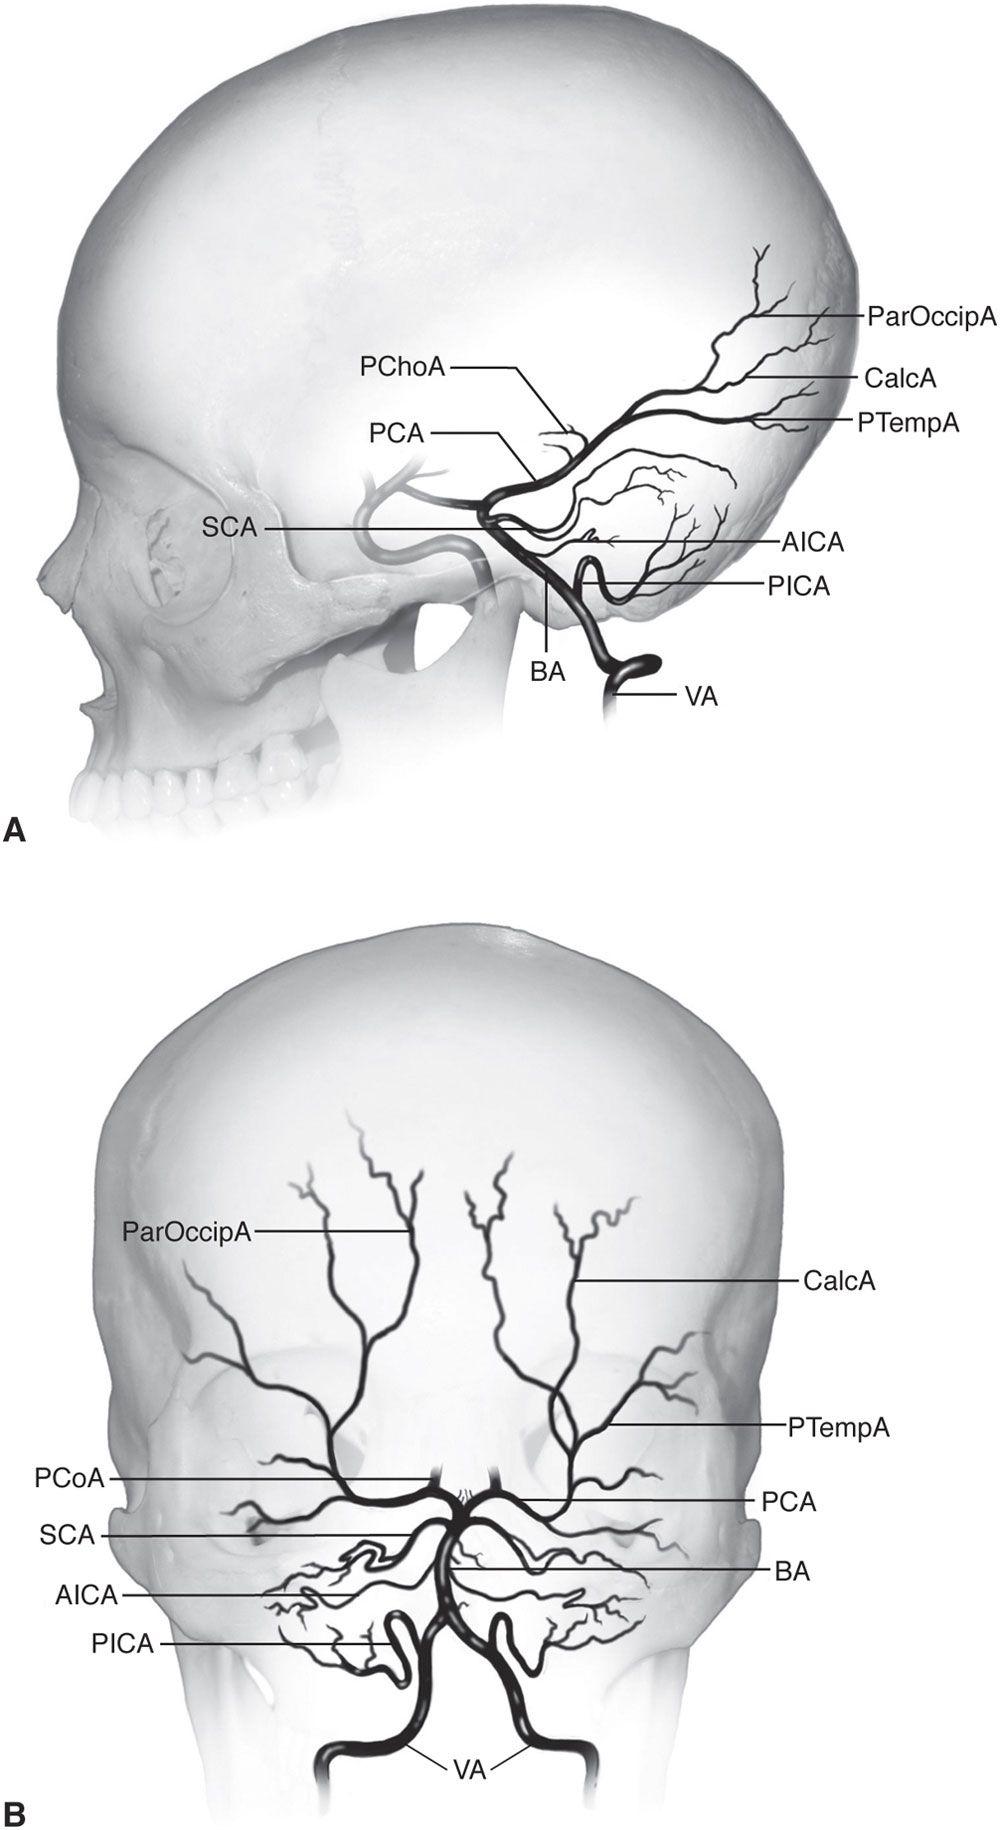 Pin by ROBERT SKONE on Anatomía fisiología Humana | Pinterest ...